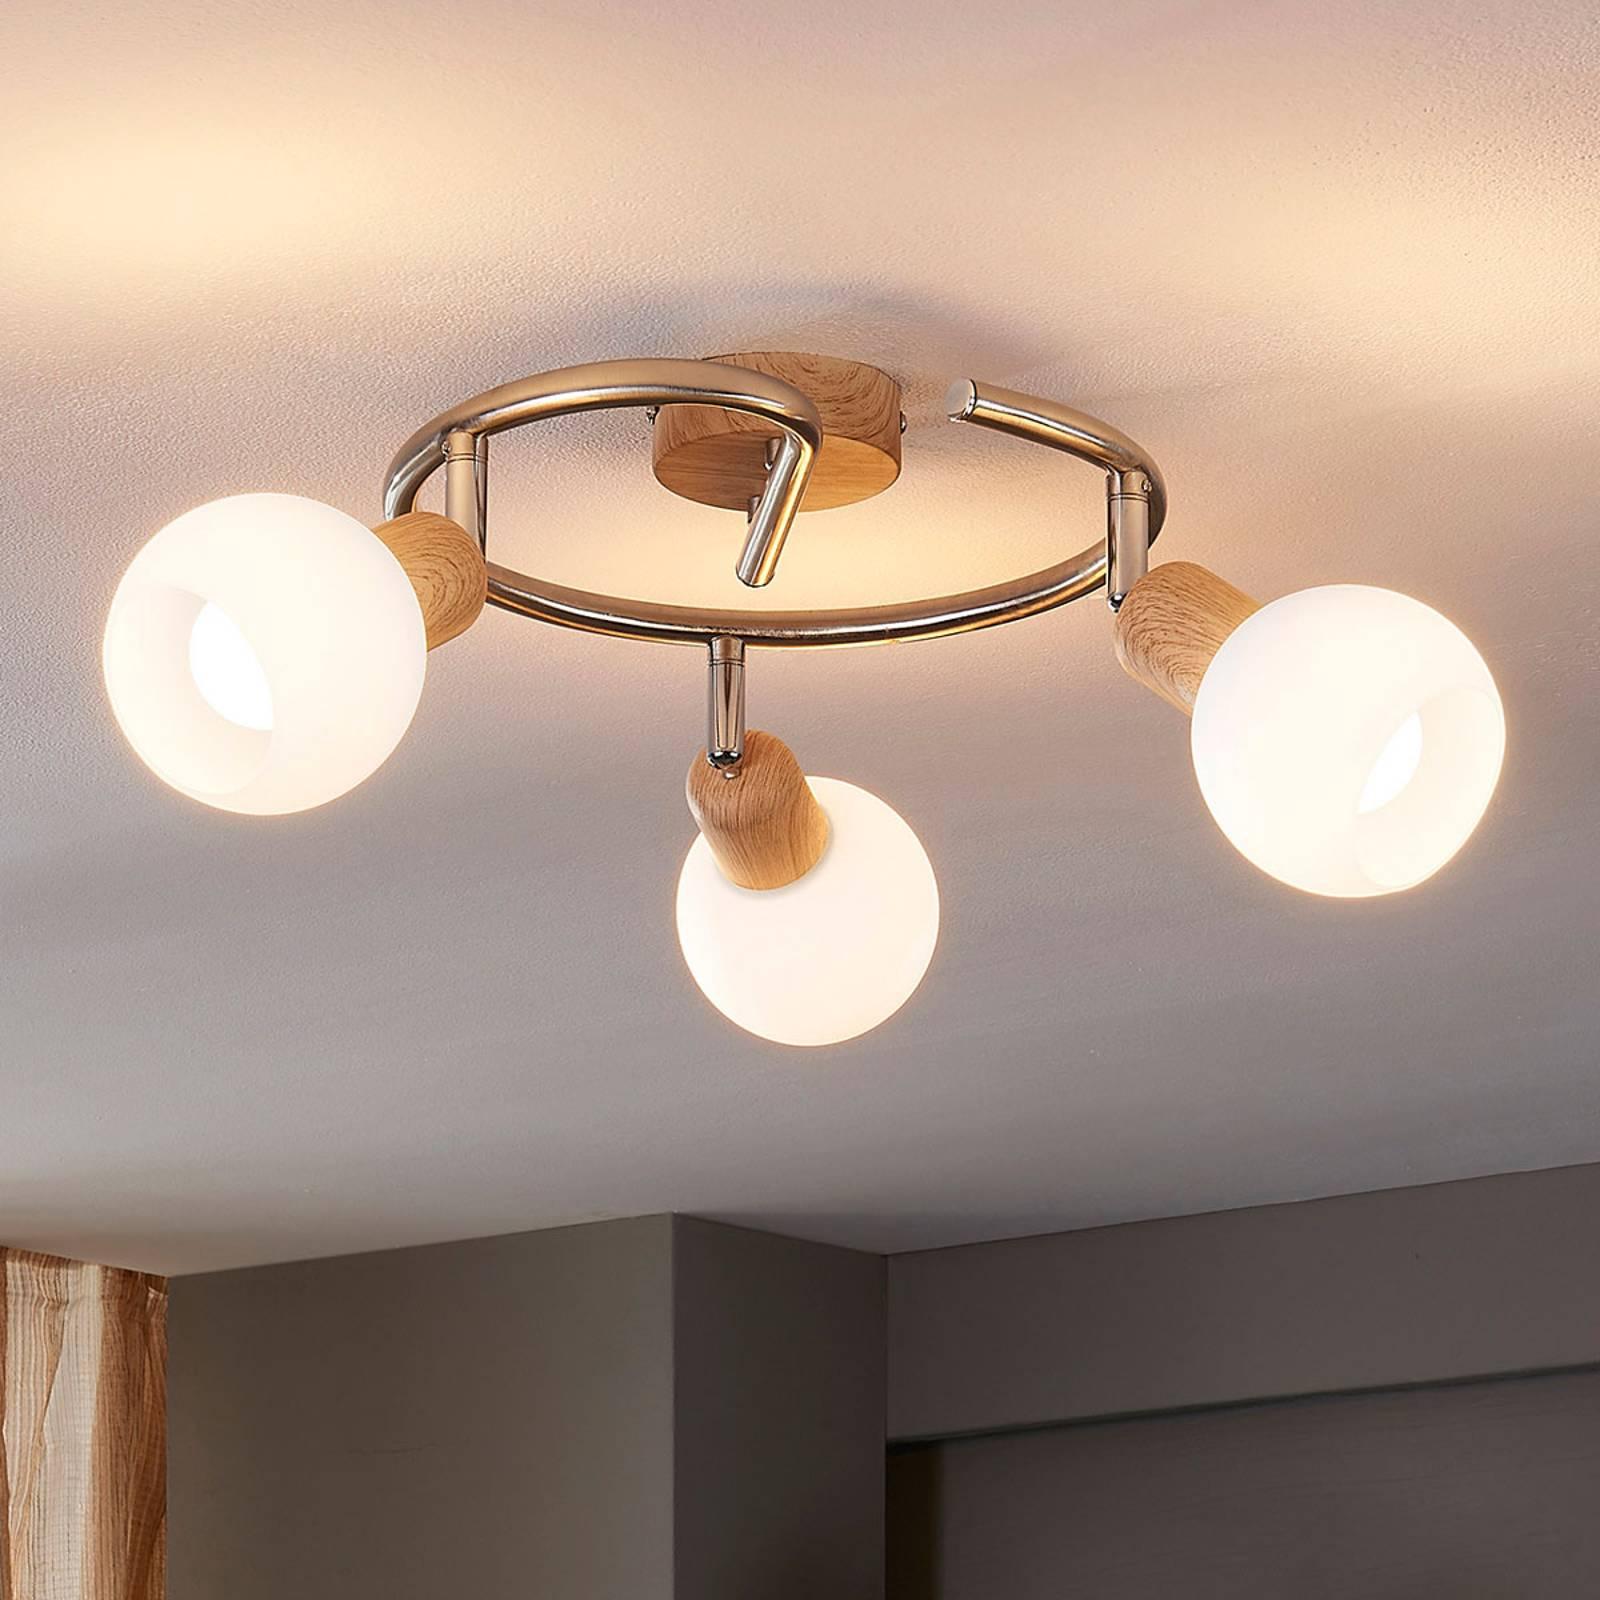 Puupintainen kattorondell Svenka, LED, E14